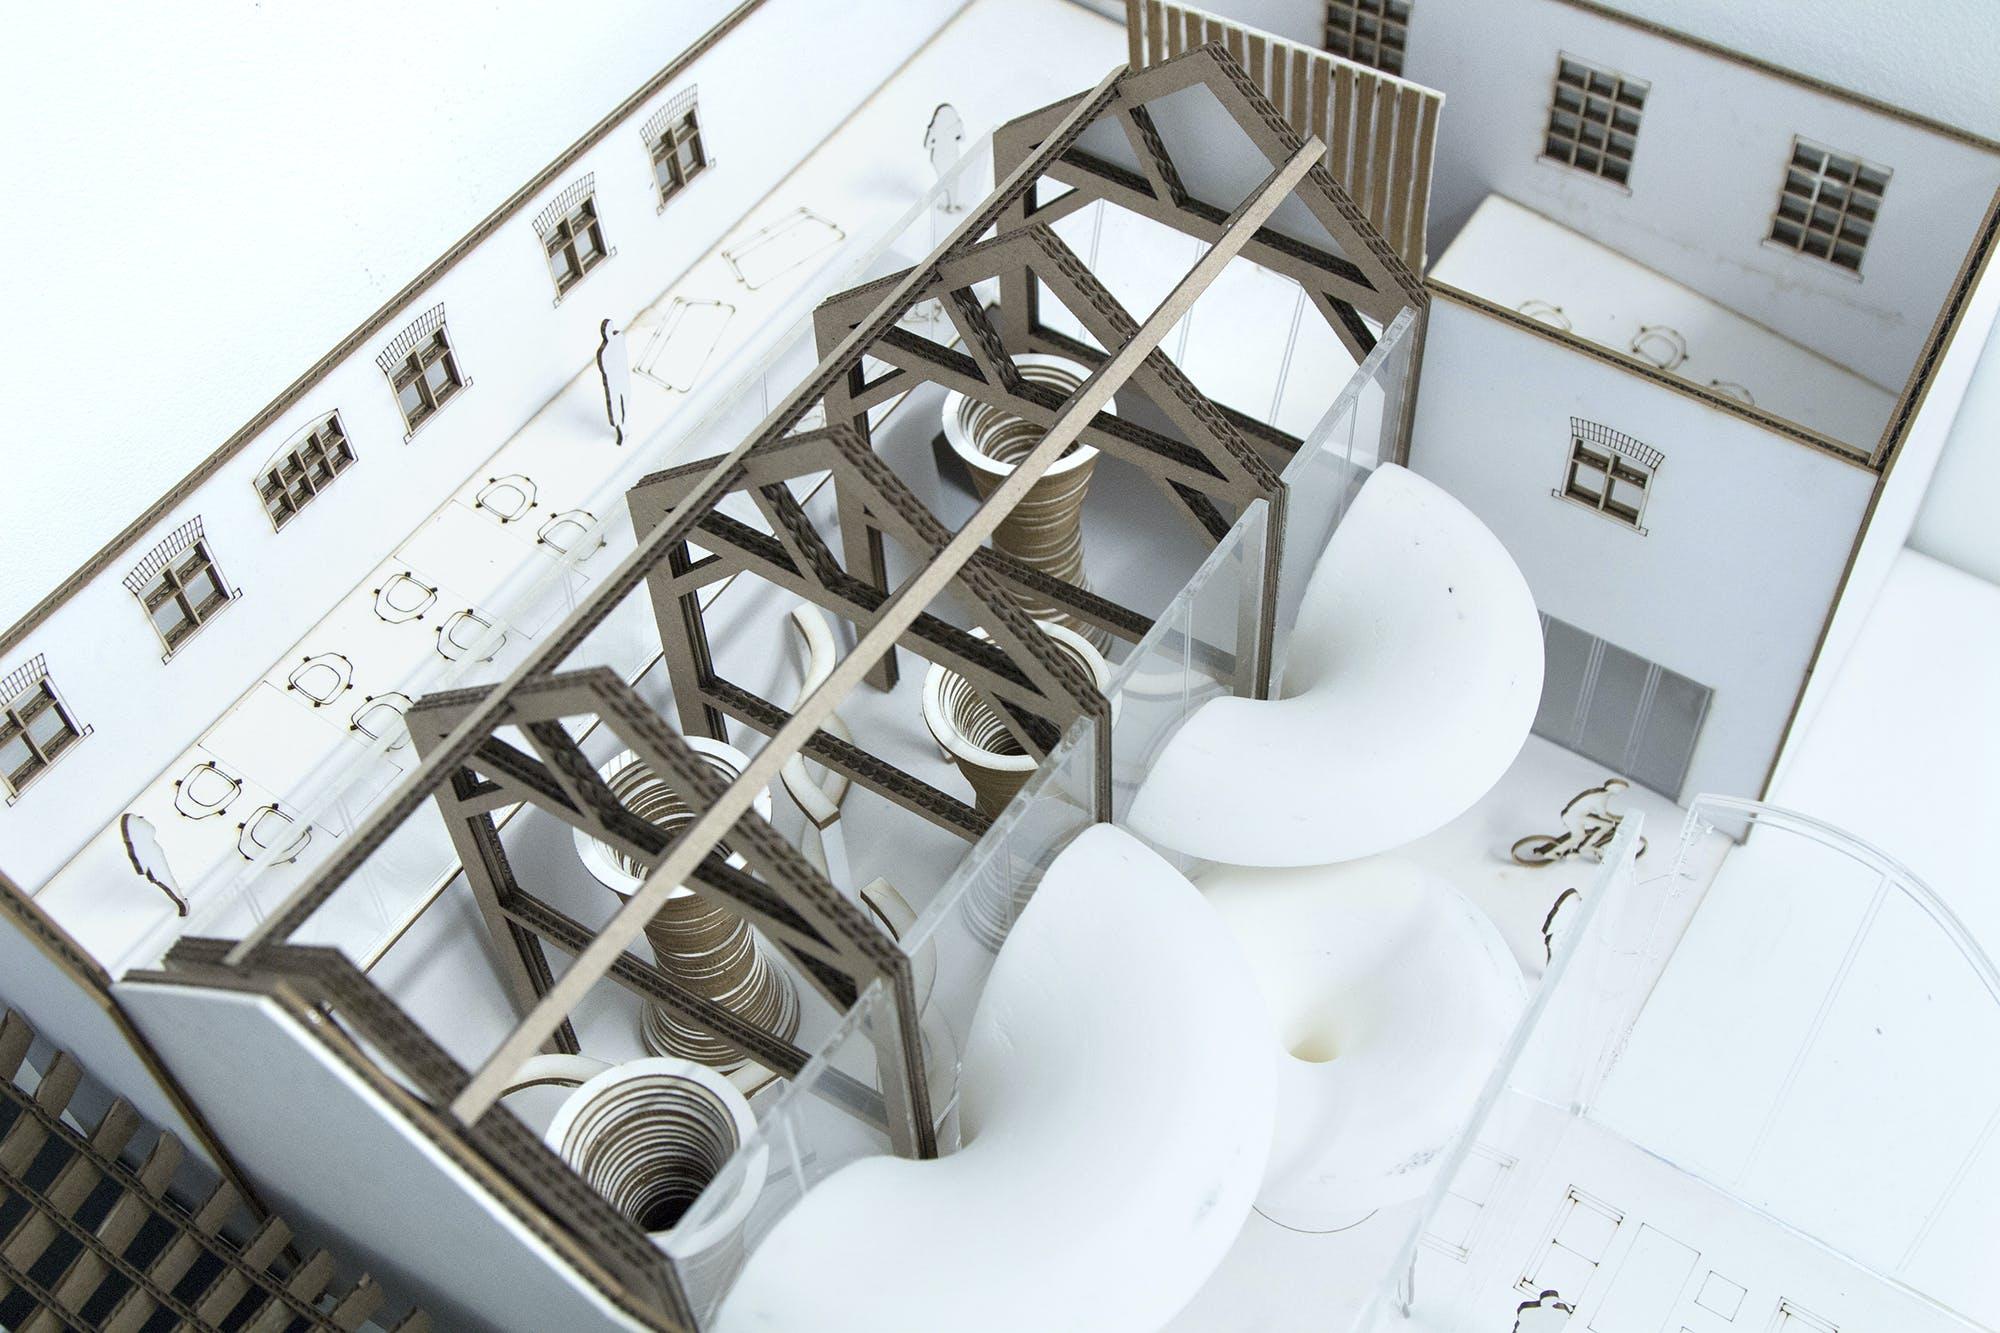 Birmingham City University Interior Architecture and Design BA